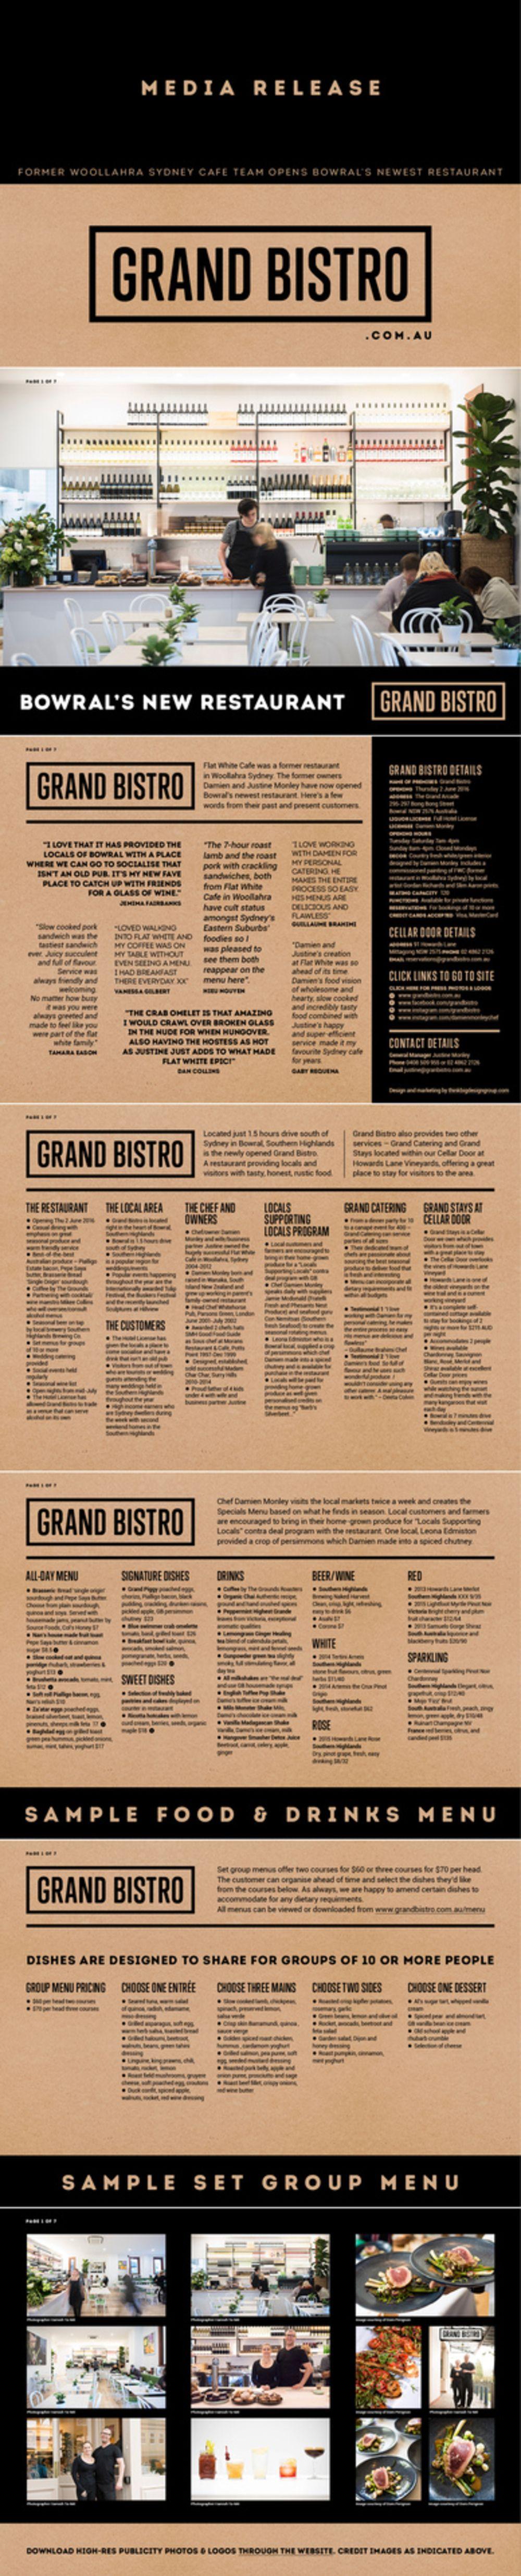 a restaurant media release   press release    press kit for